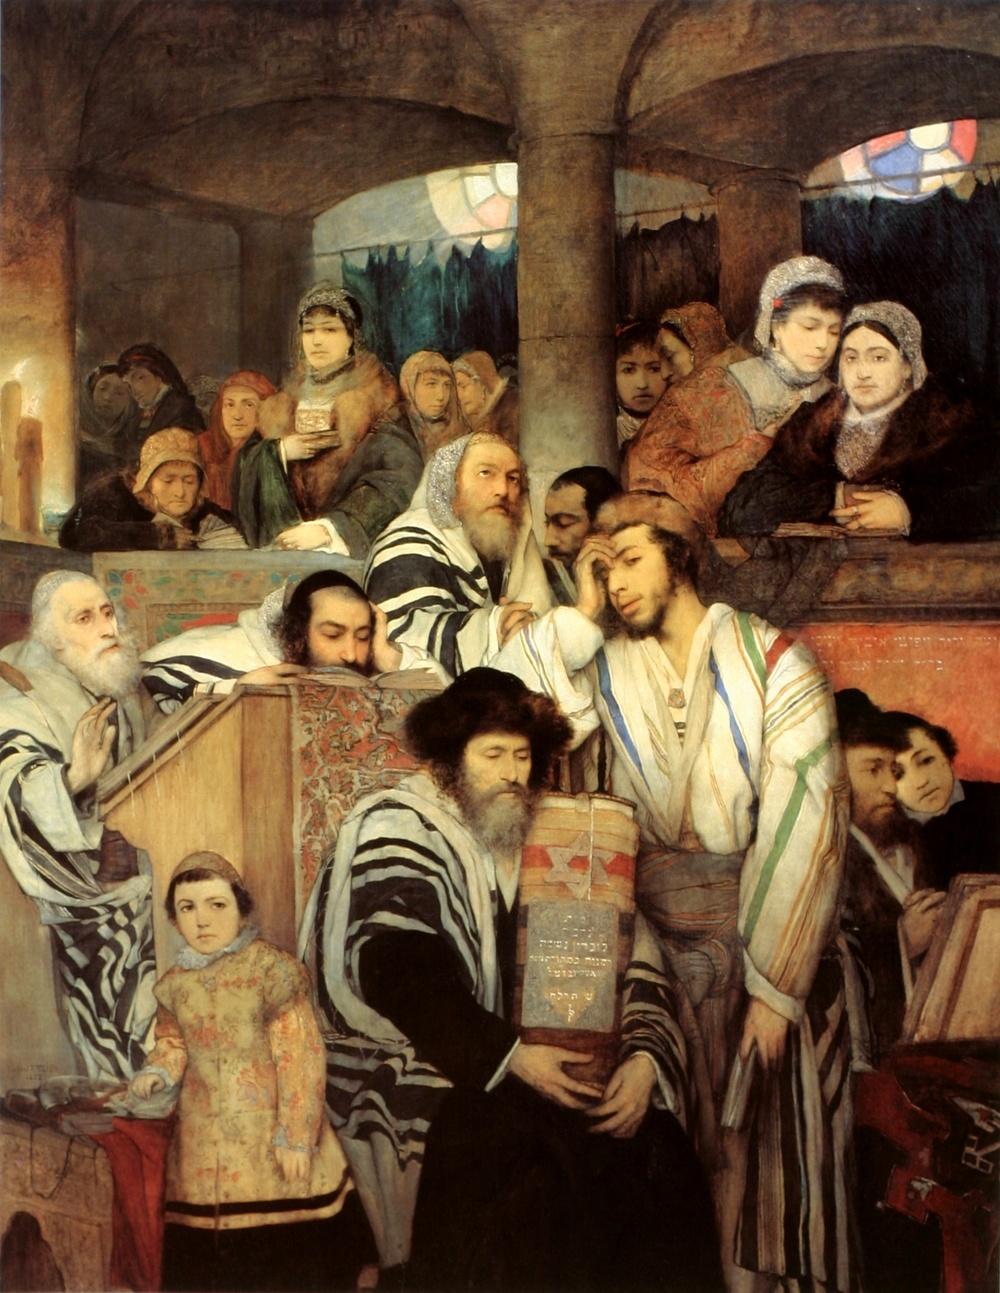 Jews Praying in the Synagogue on Yom Kippur, by Maurycy Gottlieb(1878)